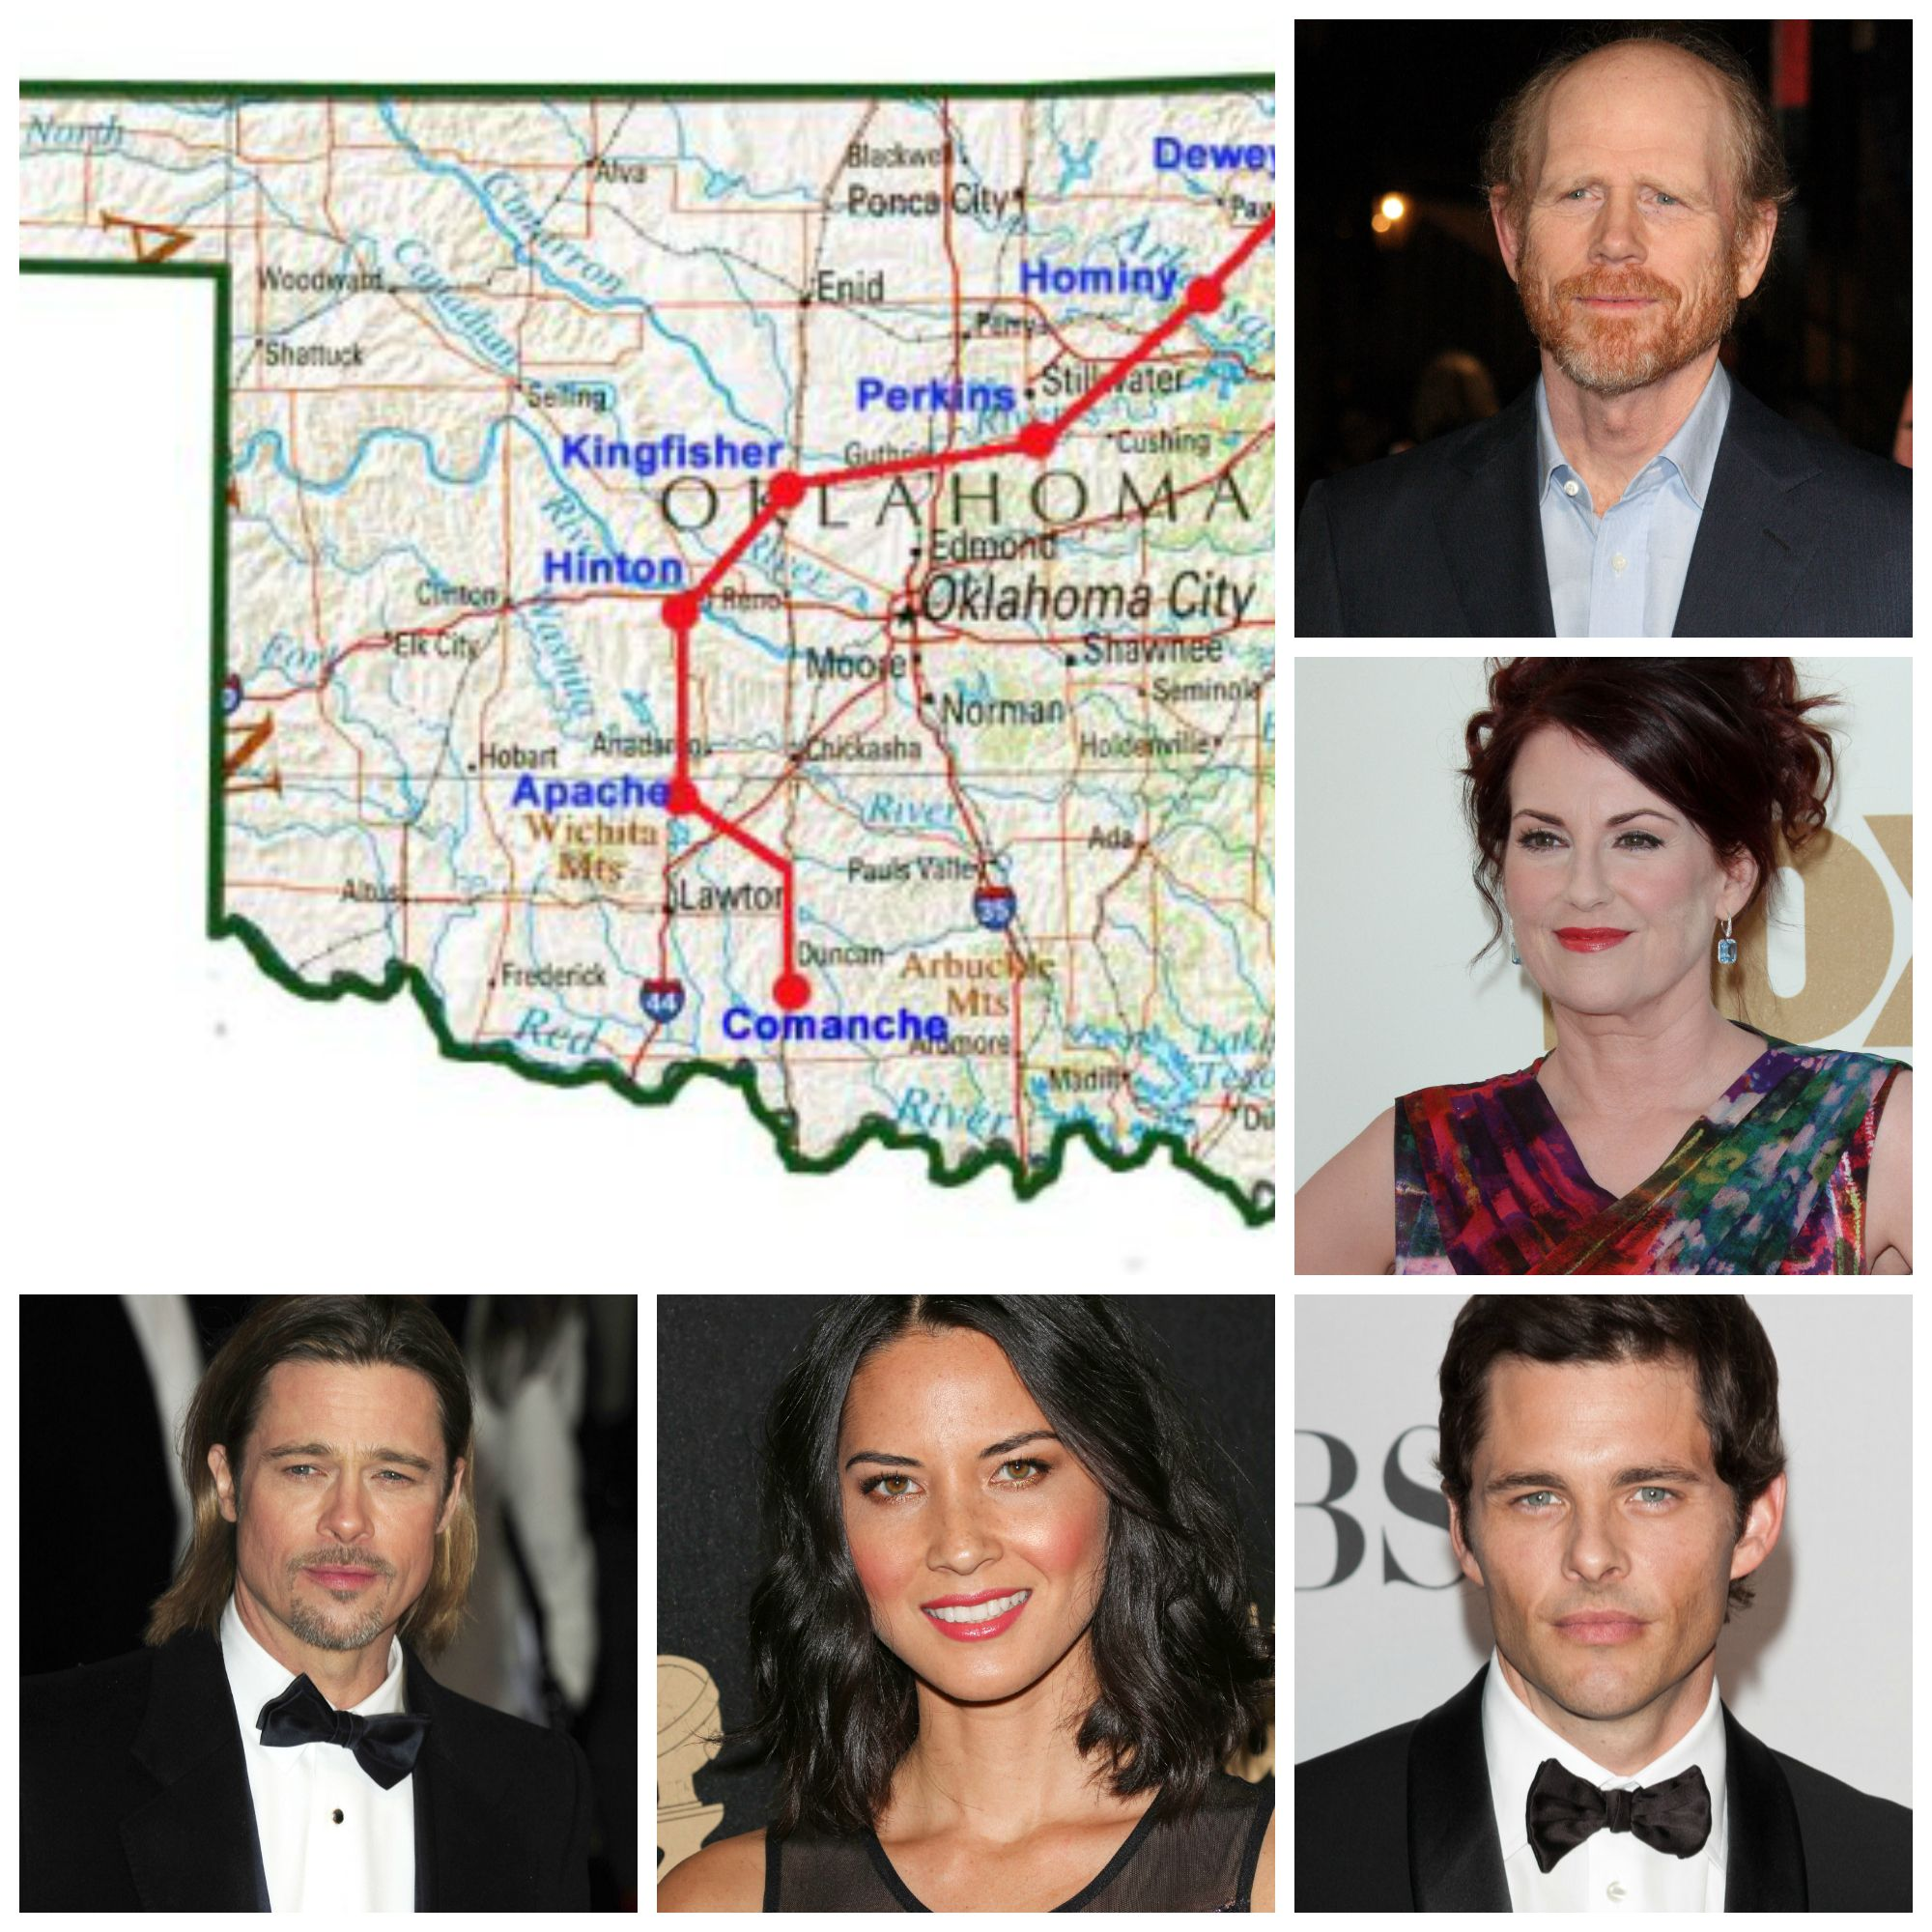 Oklahoma Tornado: Celebs React to Devastation, Tweet ...